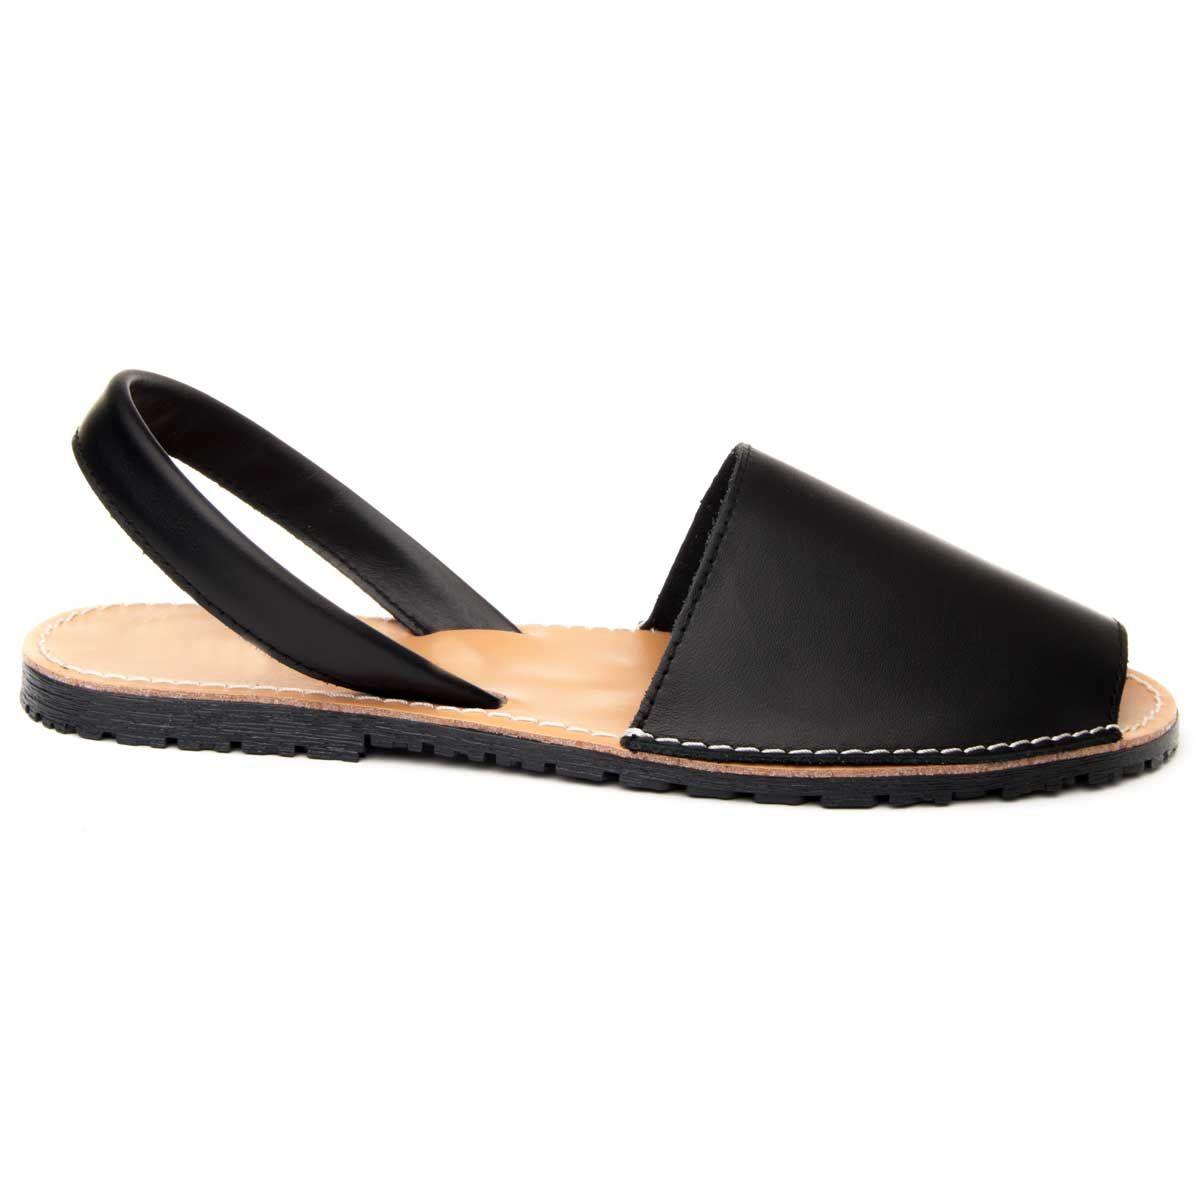 Purapiel Slingback Flat Sandal in Black